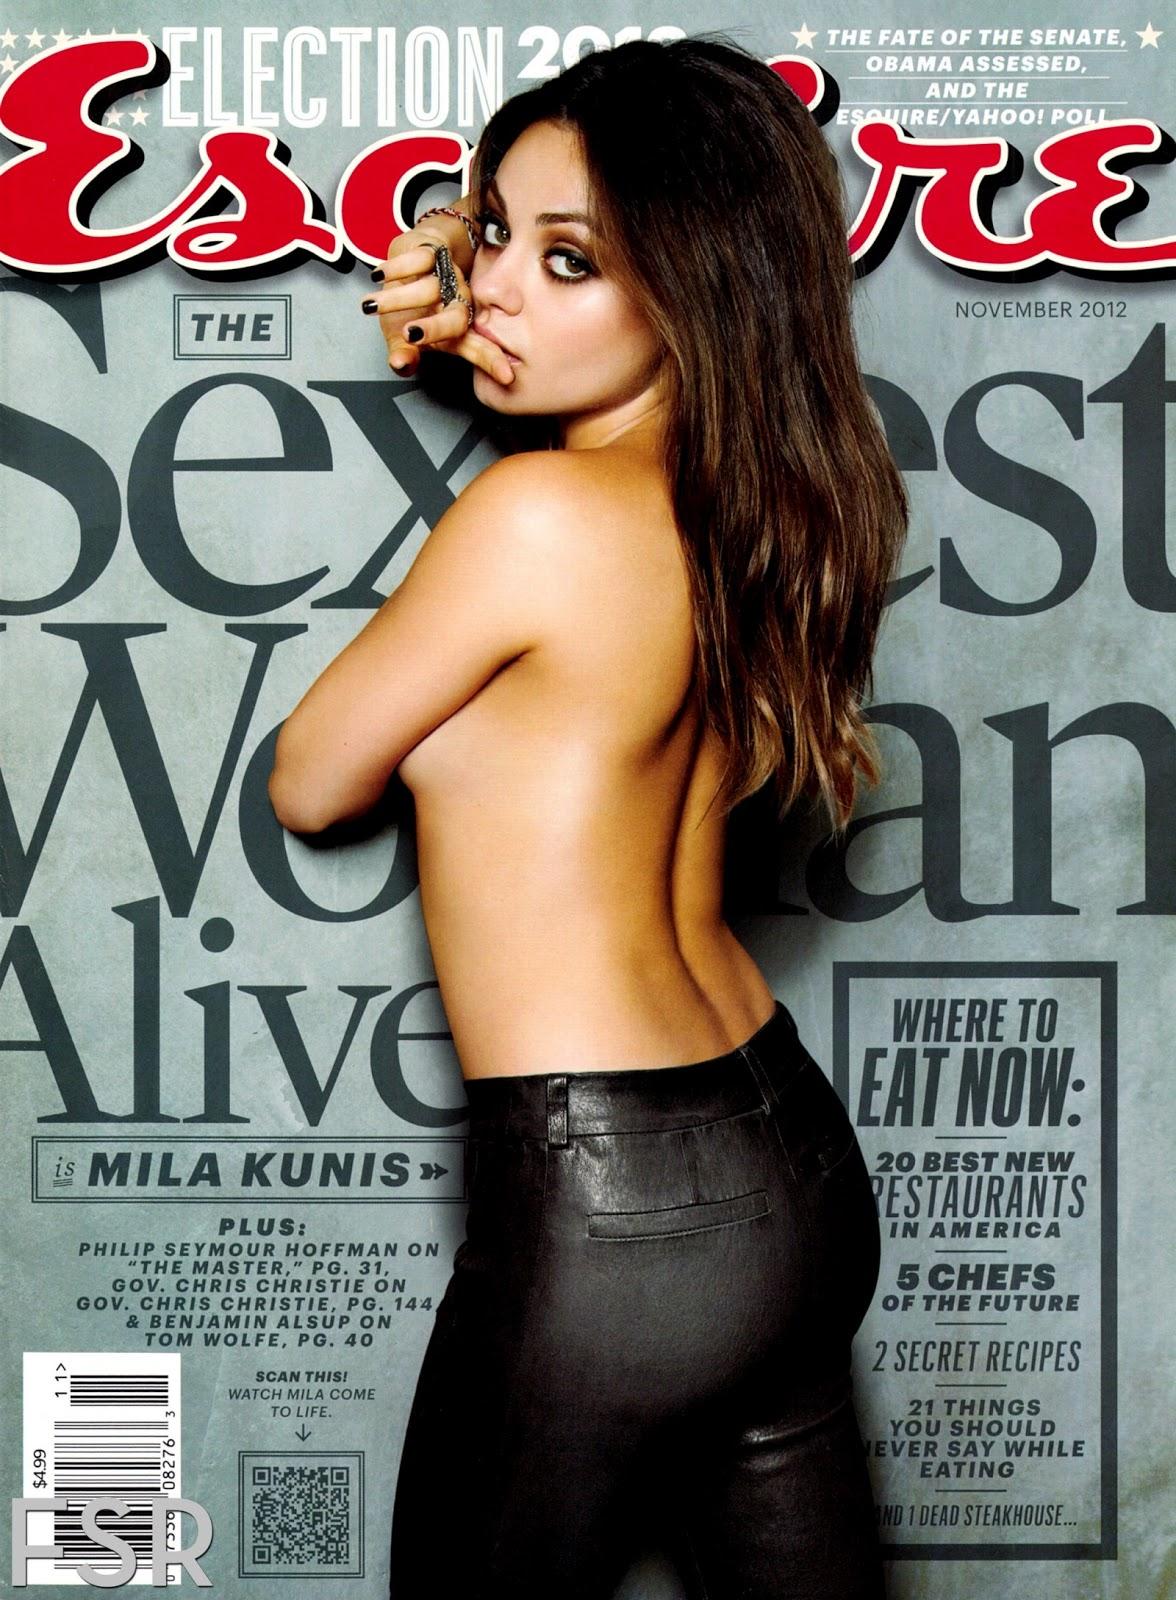 http://2.bp.blogspot.com/-VIR3Tm2CdVo/UHSh3ZLKUkI/AAAAAAAACi4/3bFvdxpK6O8/s1600/Mila-Kunis-esquire-novembro-2012-mulher-mais-sexy-do-mundo-1.jpg